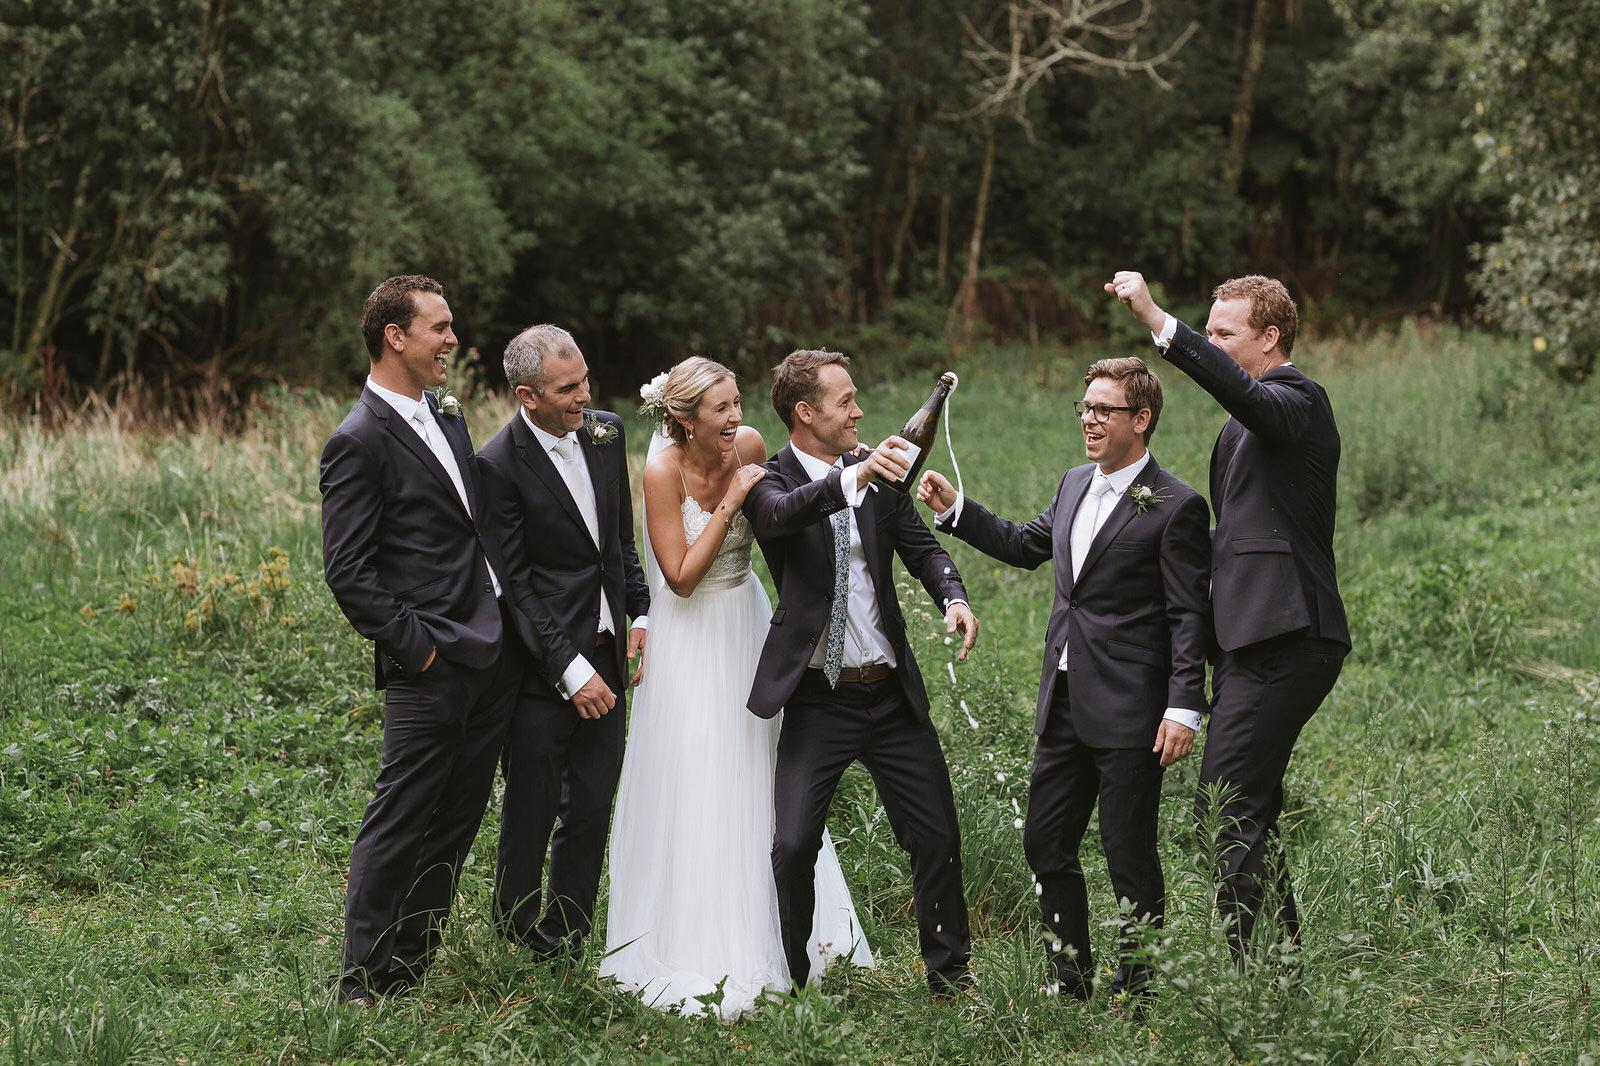 newfound-r-s-ataahua-garden-venue-tauranga-wedding-090